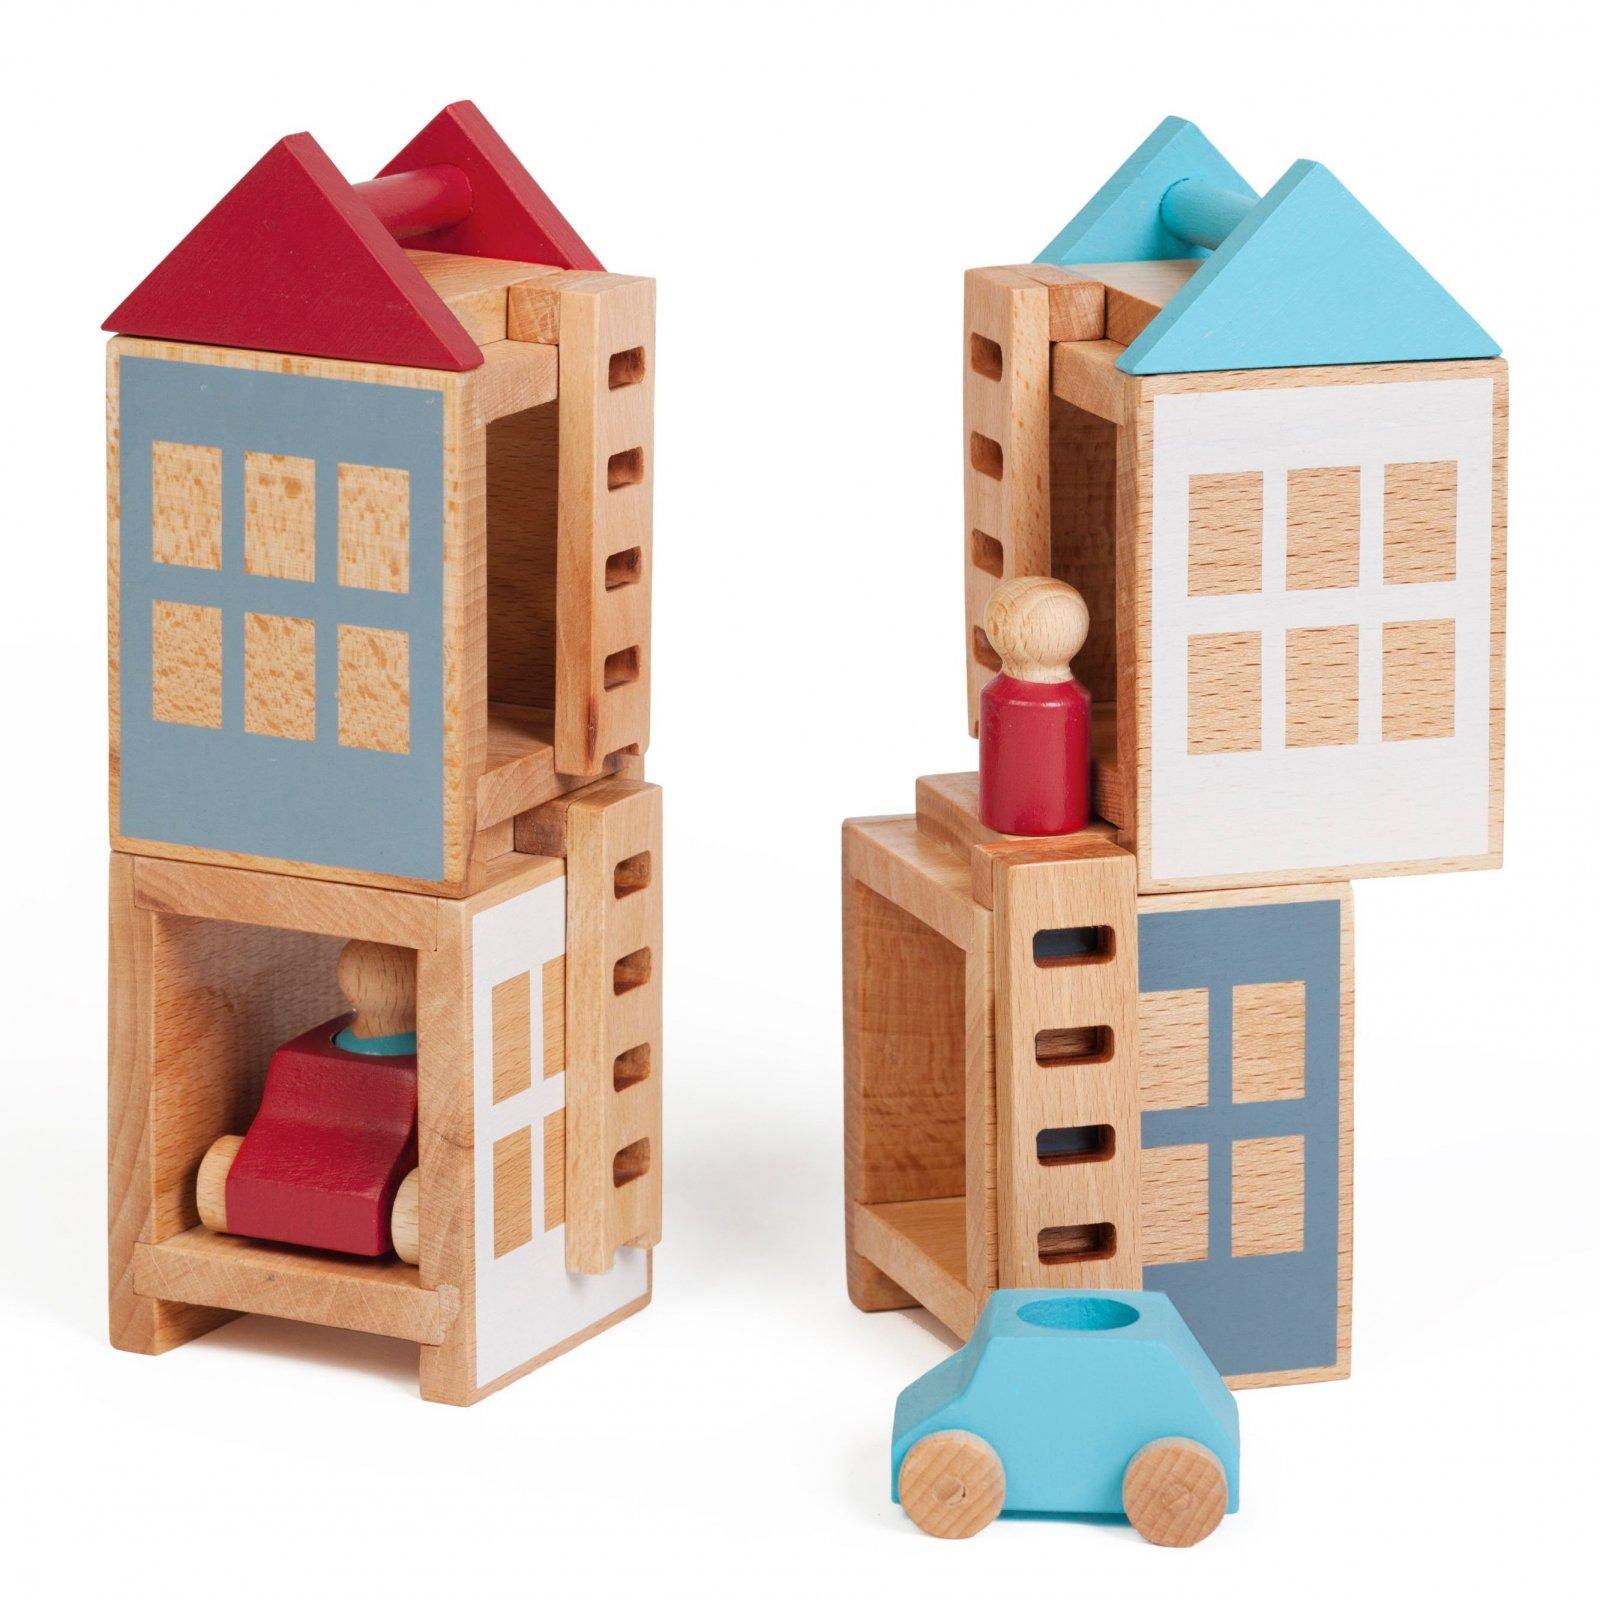 Lubu Town Maxi Construction Set - Summerville by Lubulona